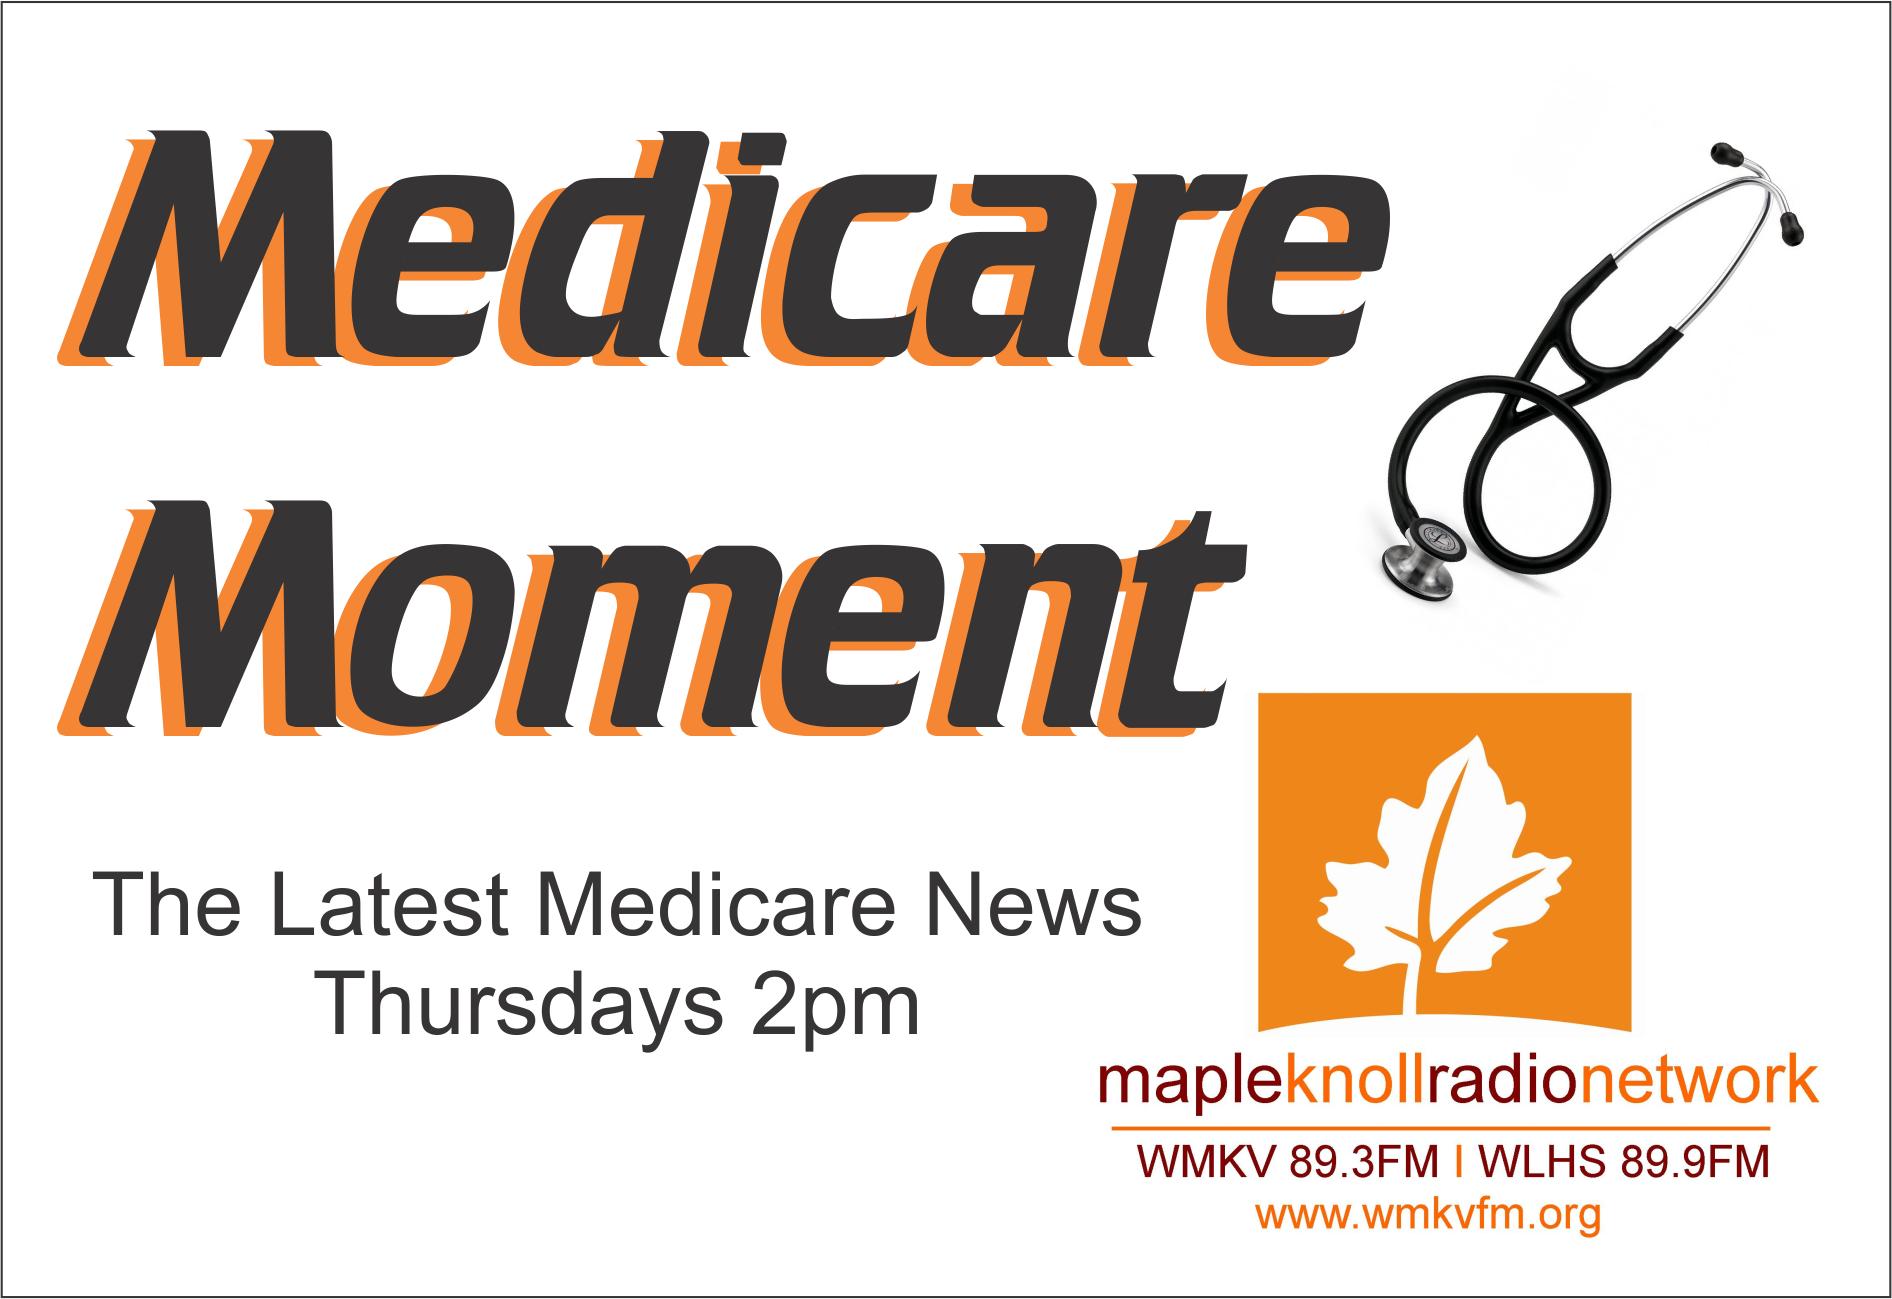 Medicare Moment